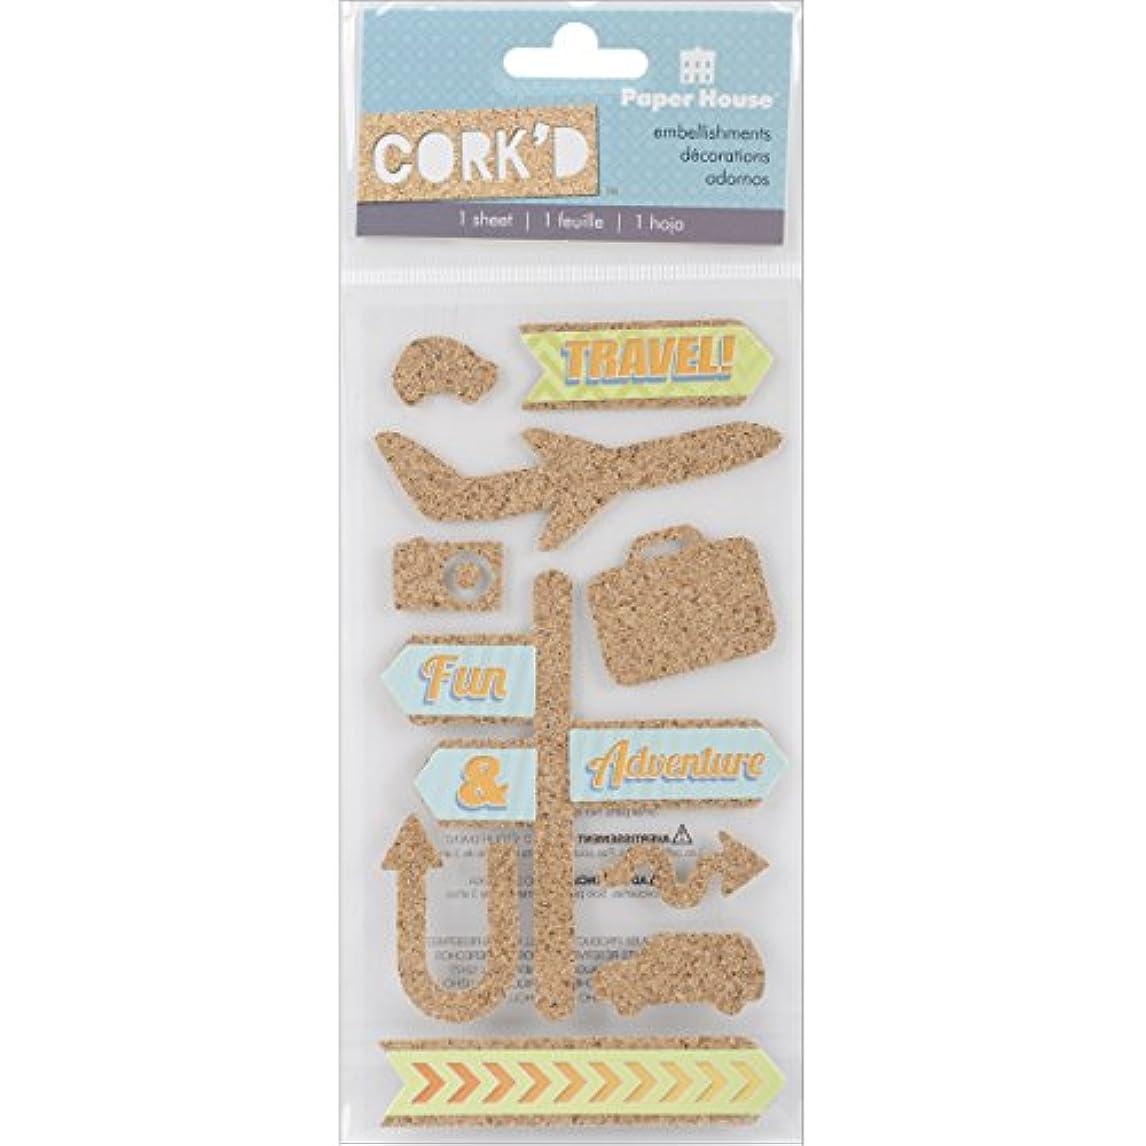 Paper House Productions STCO-0007E Cork'd Embellishments, Travel dppor48430220241